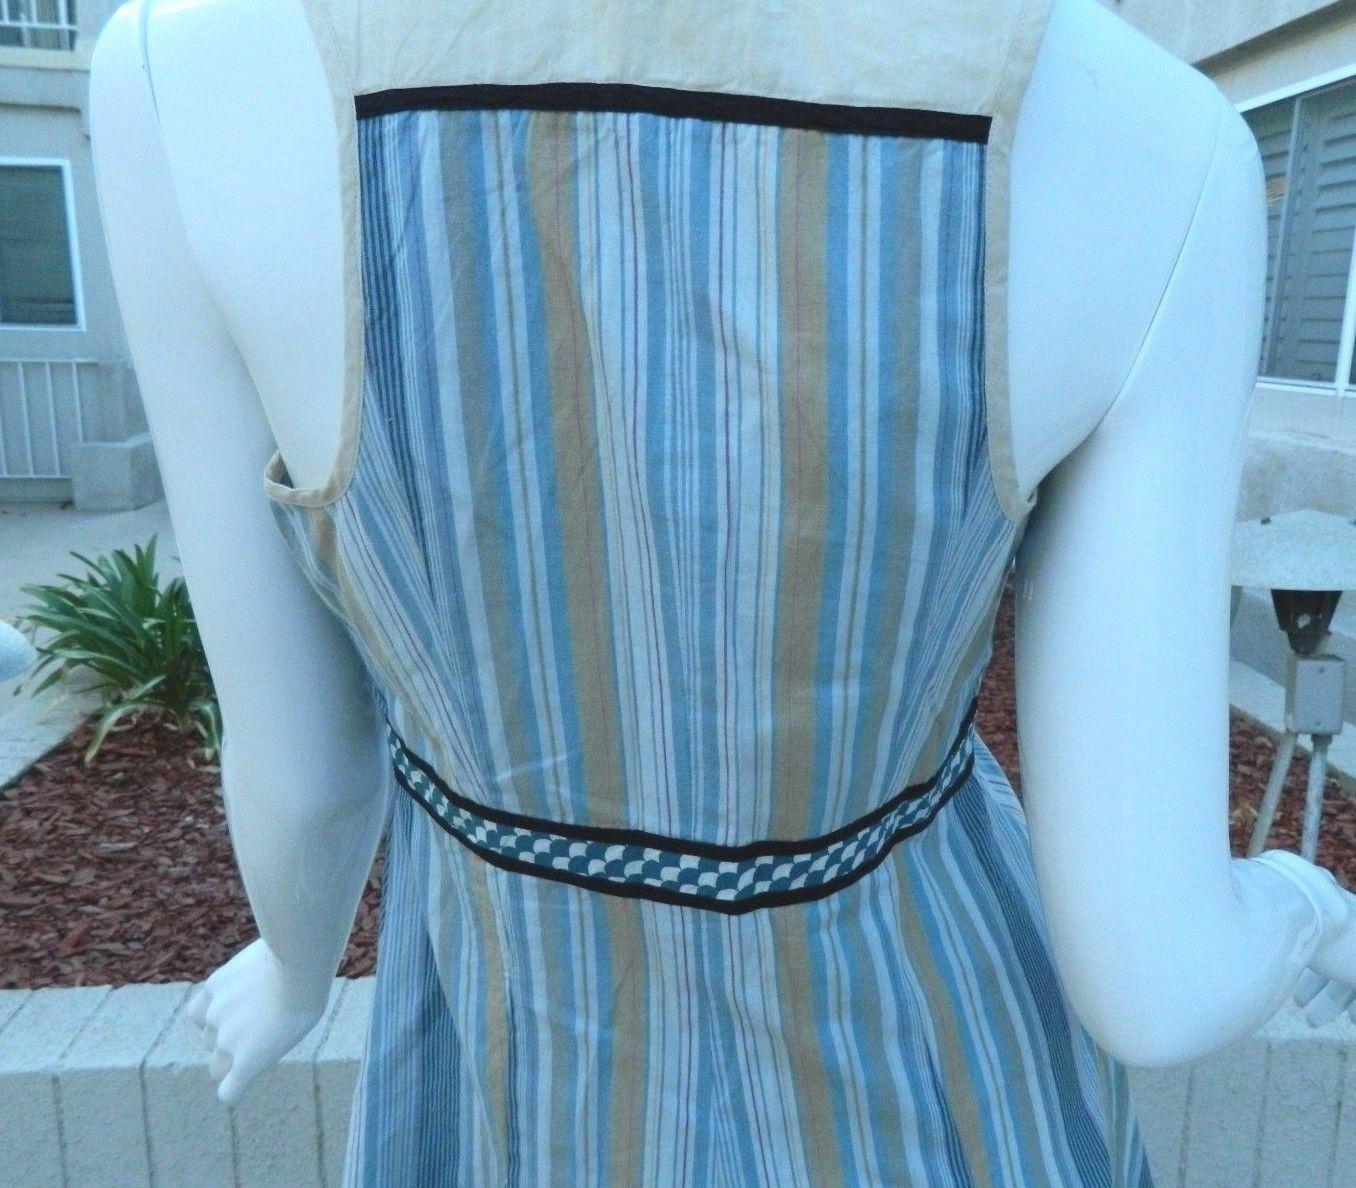 FREE PEOPLE Dress Cornflower Blue and Beige Striped Dress-Size 4